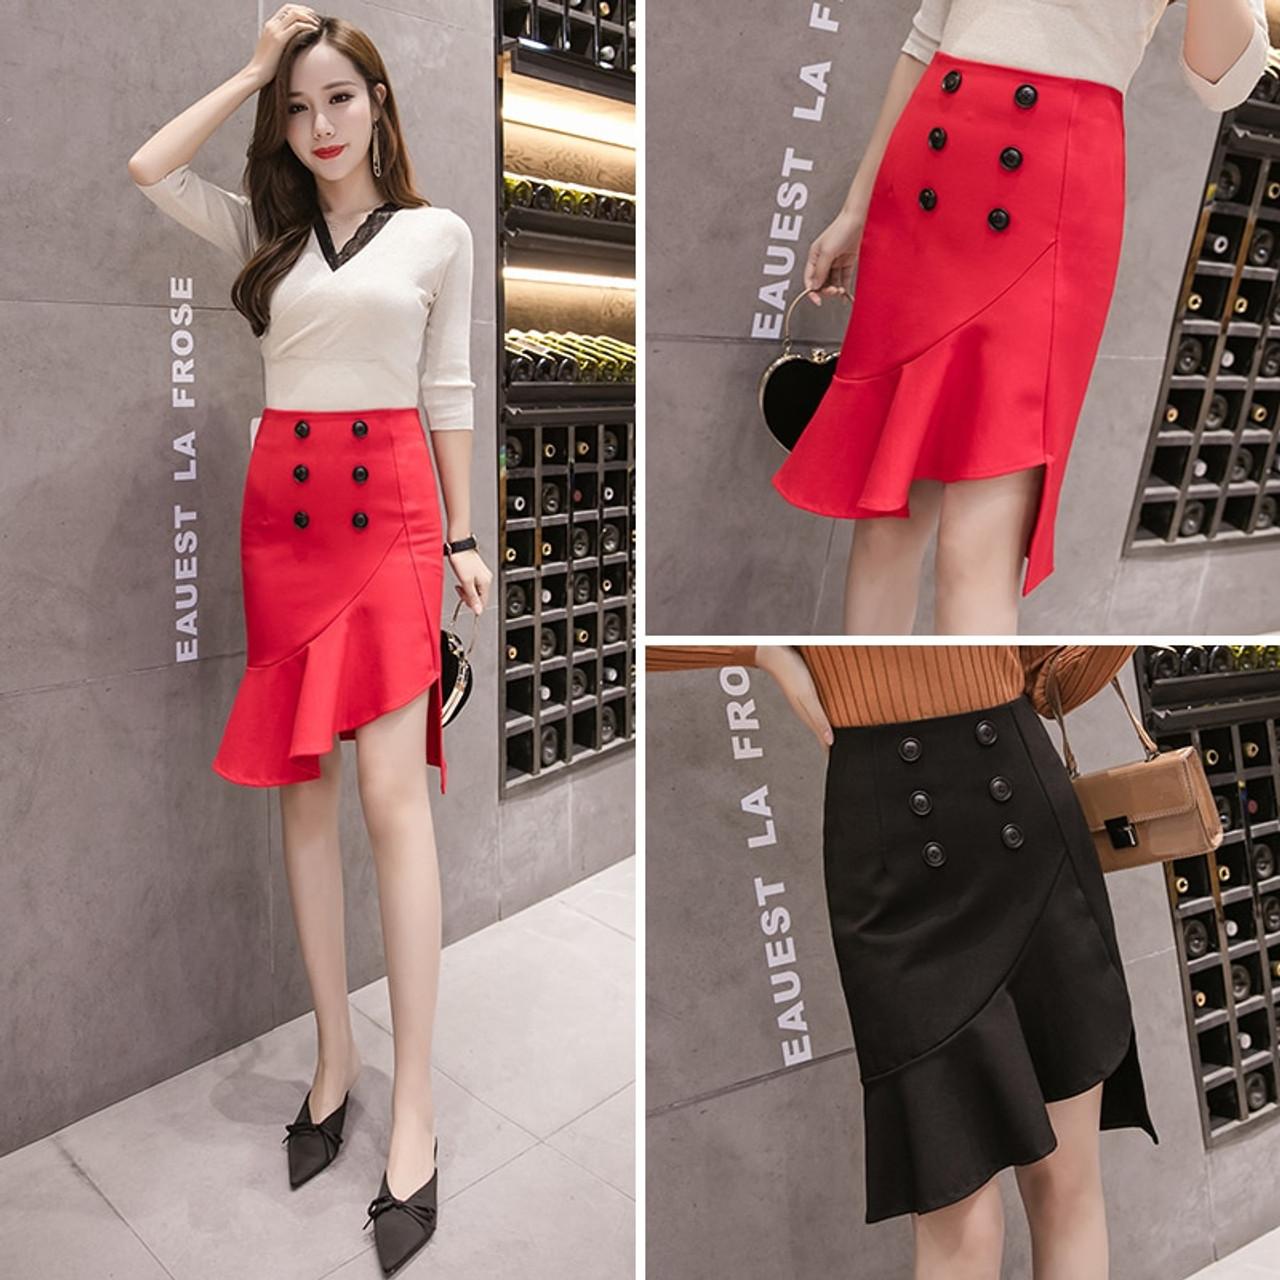 e663b6c17 ... 2018 Autumn Elegant Midi Skirt Women Fashion Button Half-length  Irregular Solid Skirt Office Ladies ...